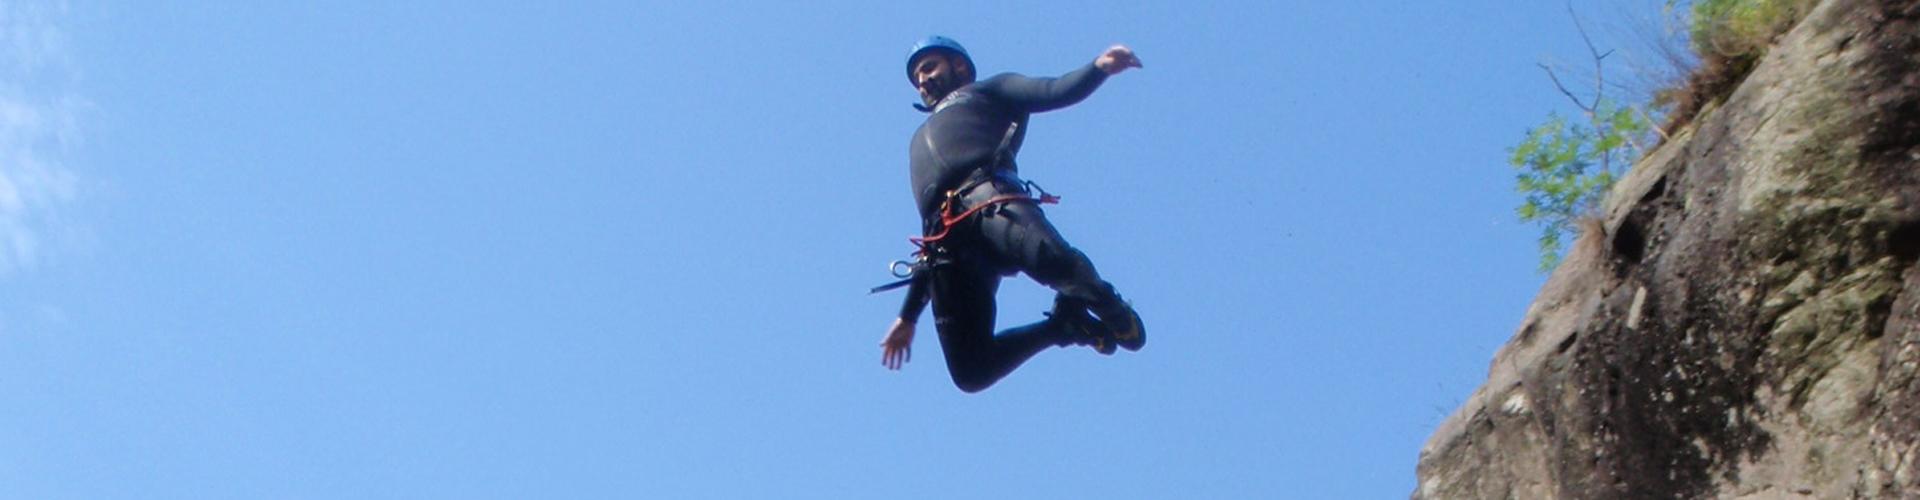 canyoning saut